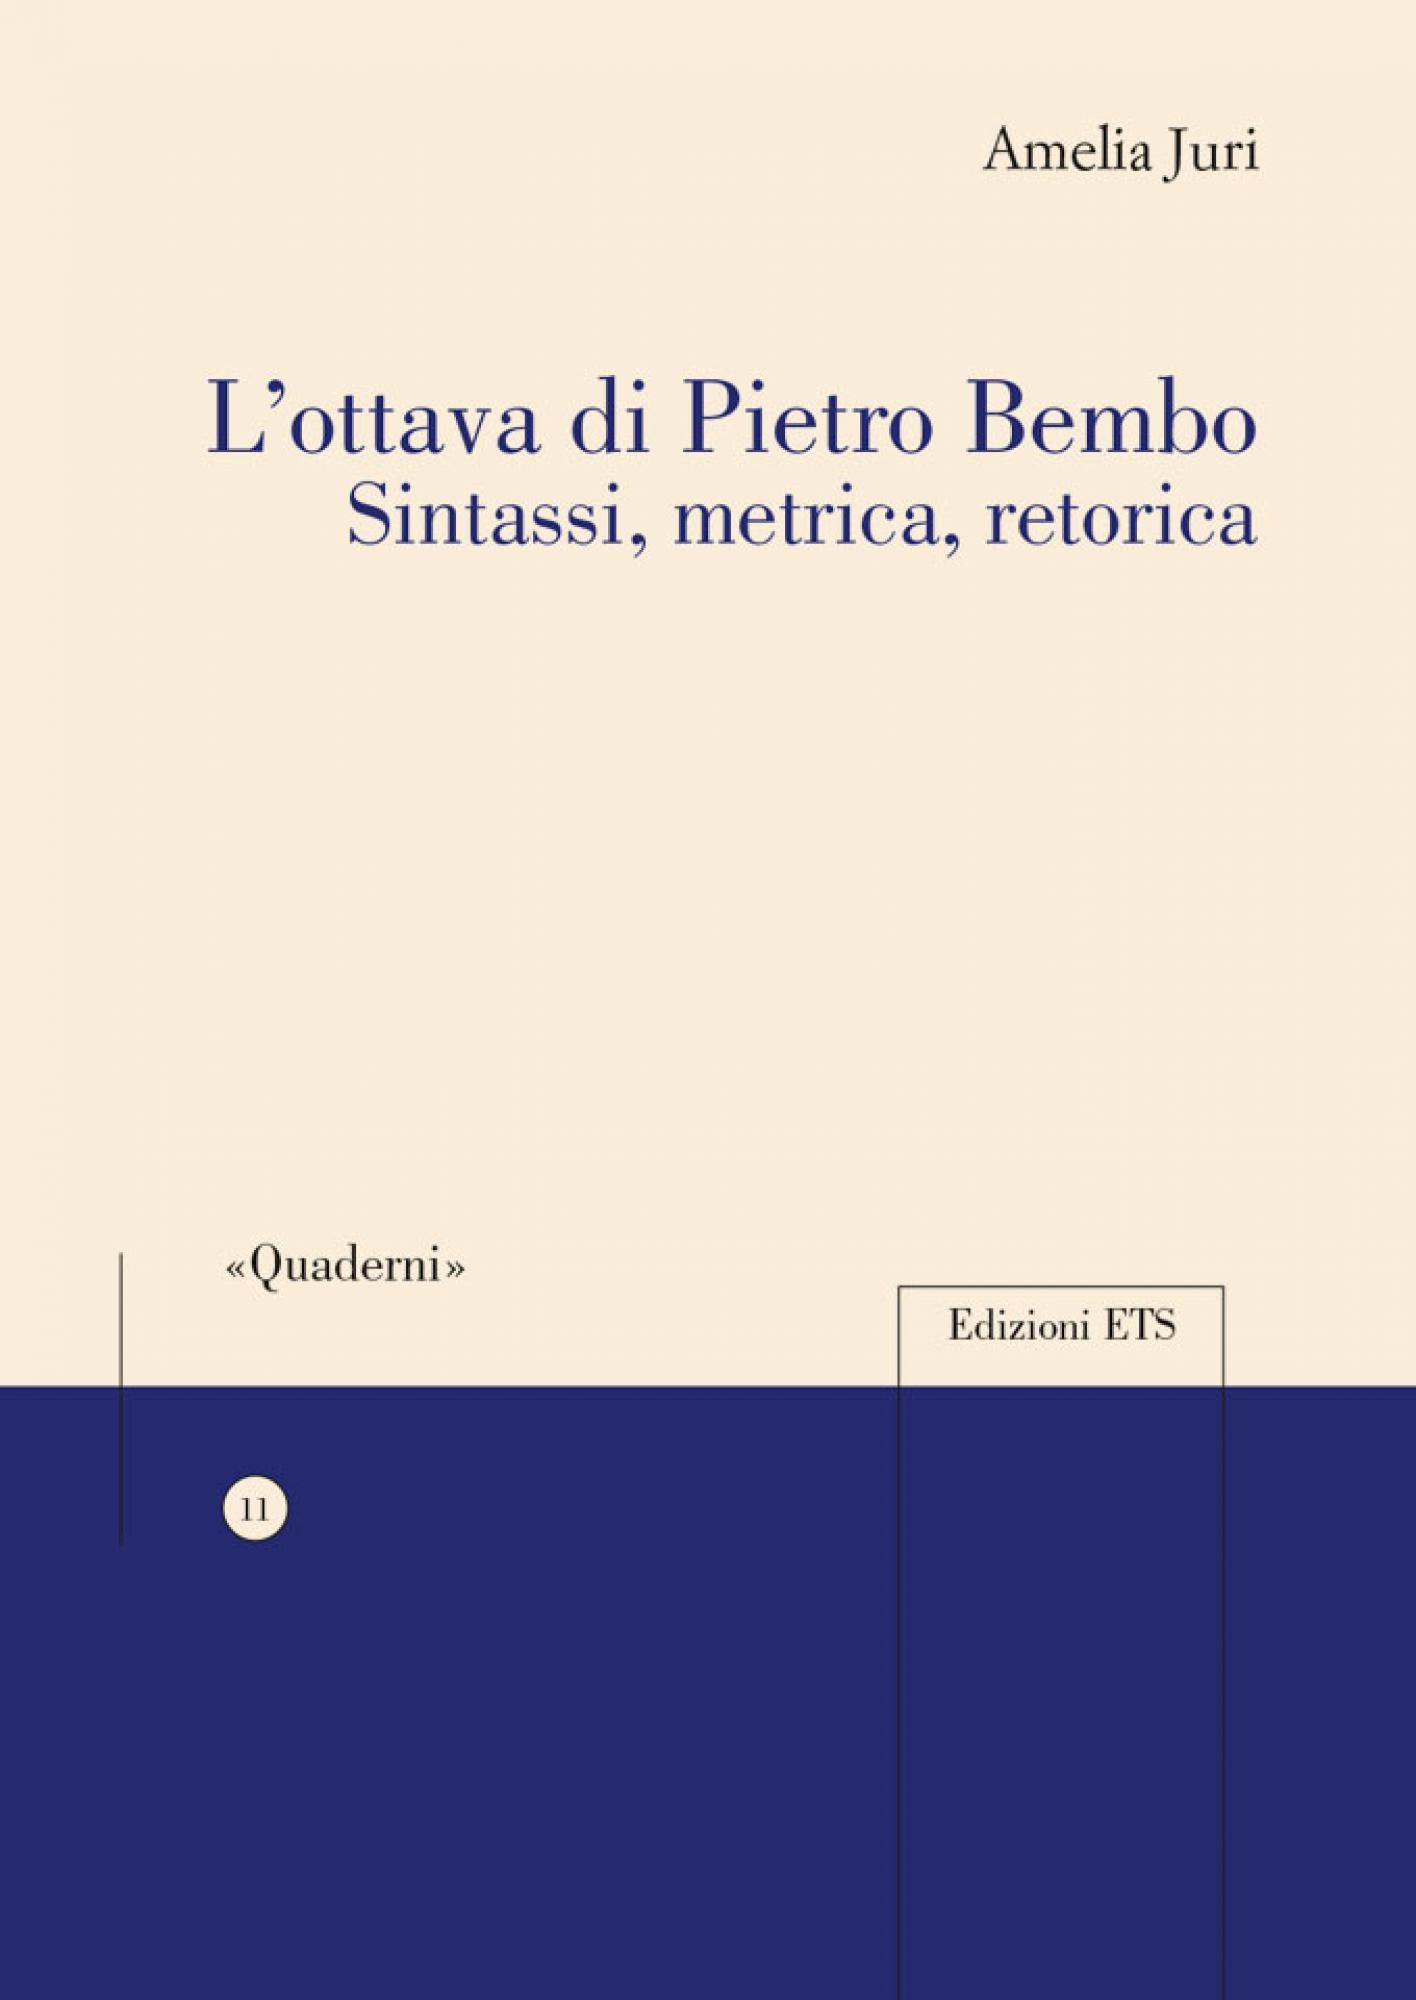 L'ottava di Pietro Bembo.Sintassi, metrica, retorica